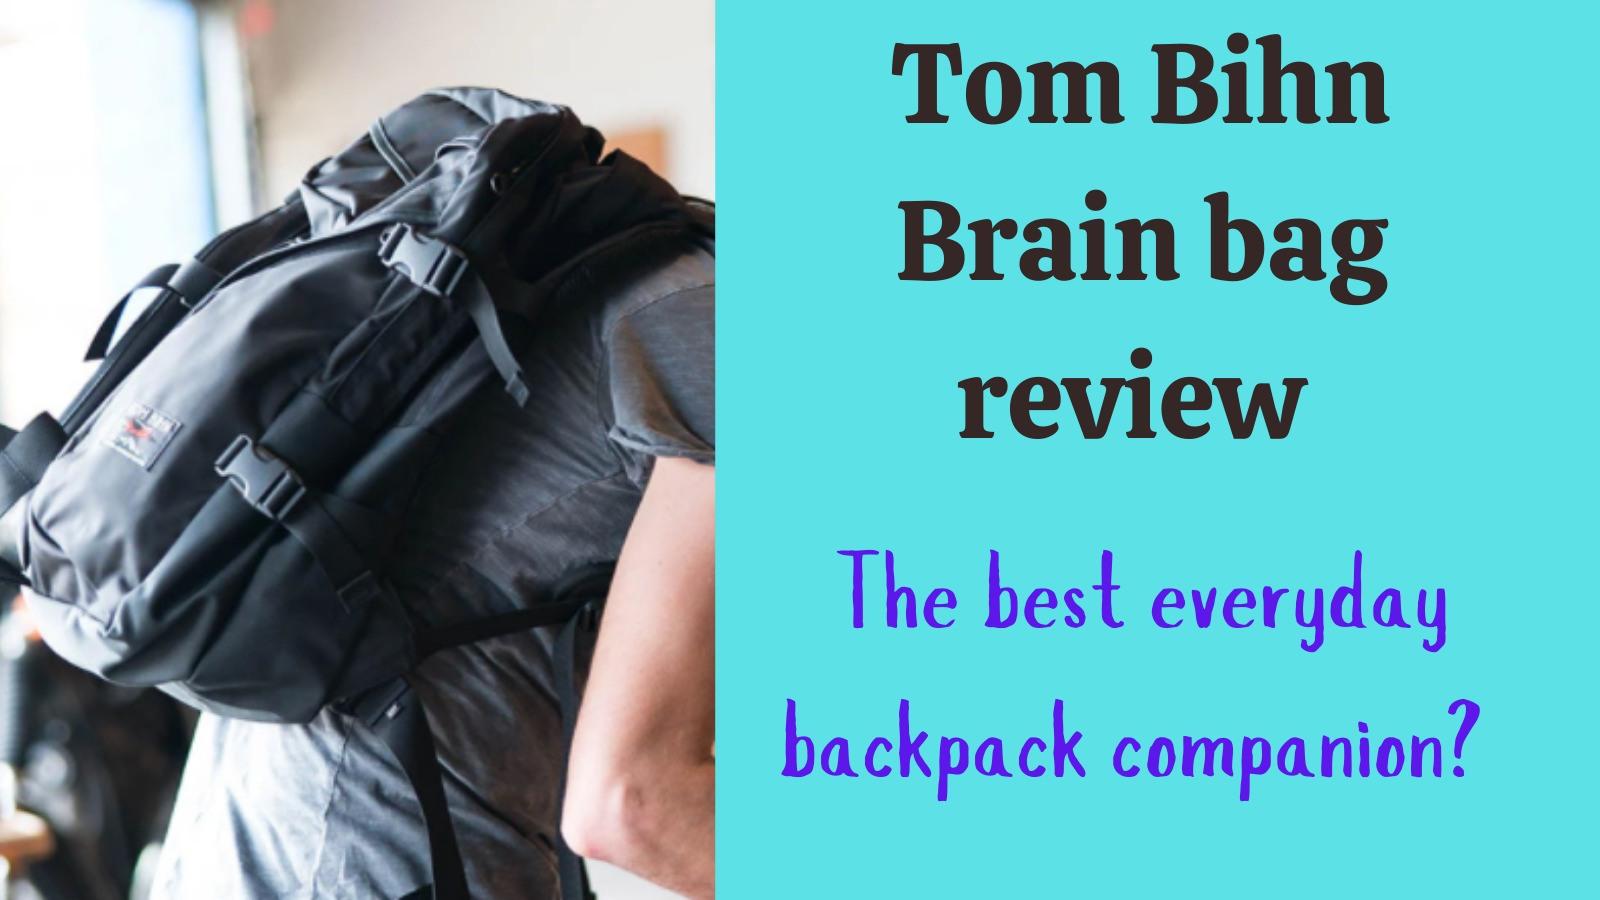 Tom Bihn Brain bag review: feature image